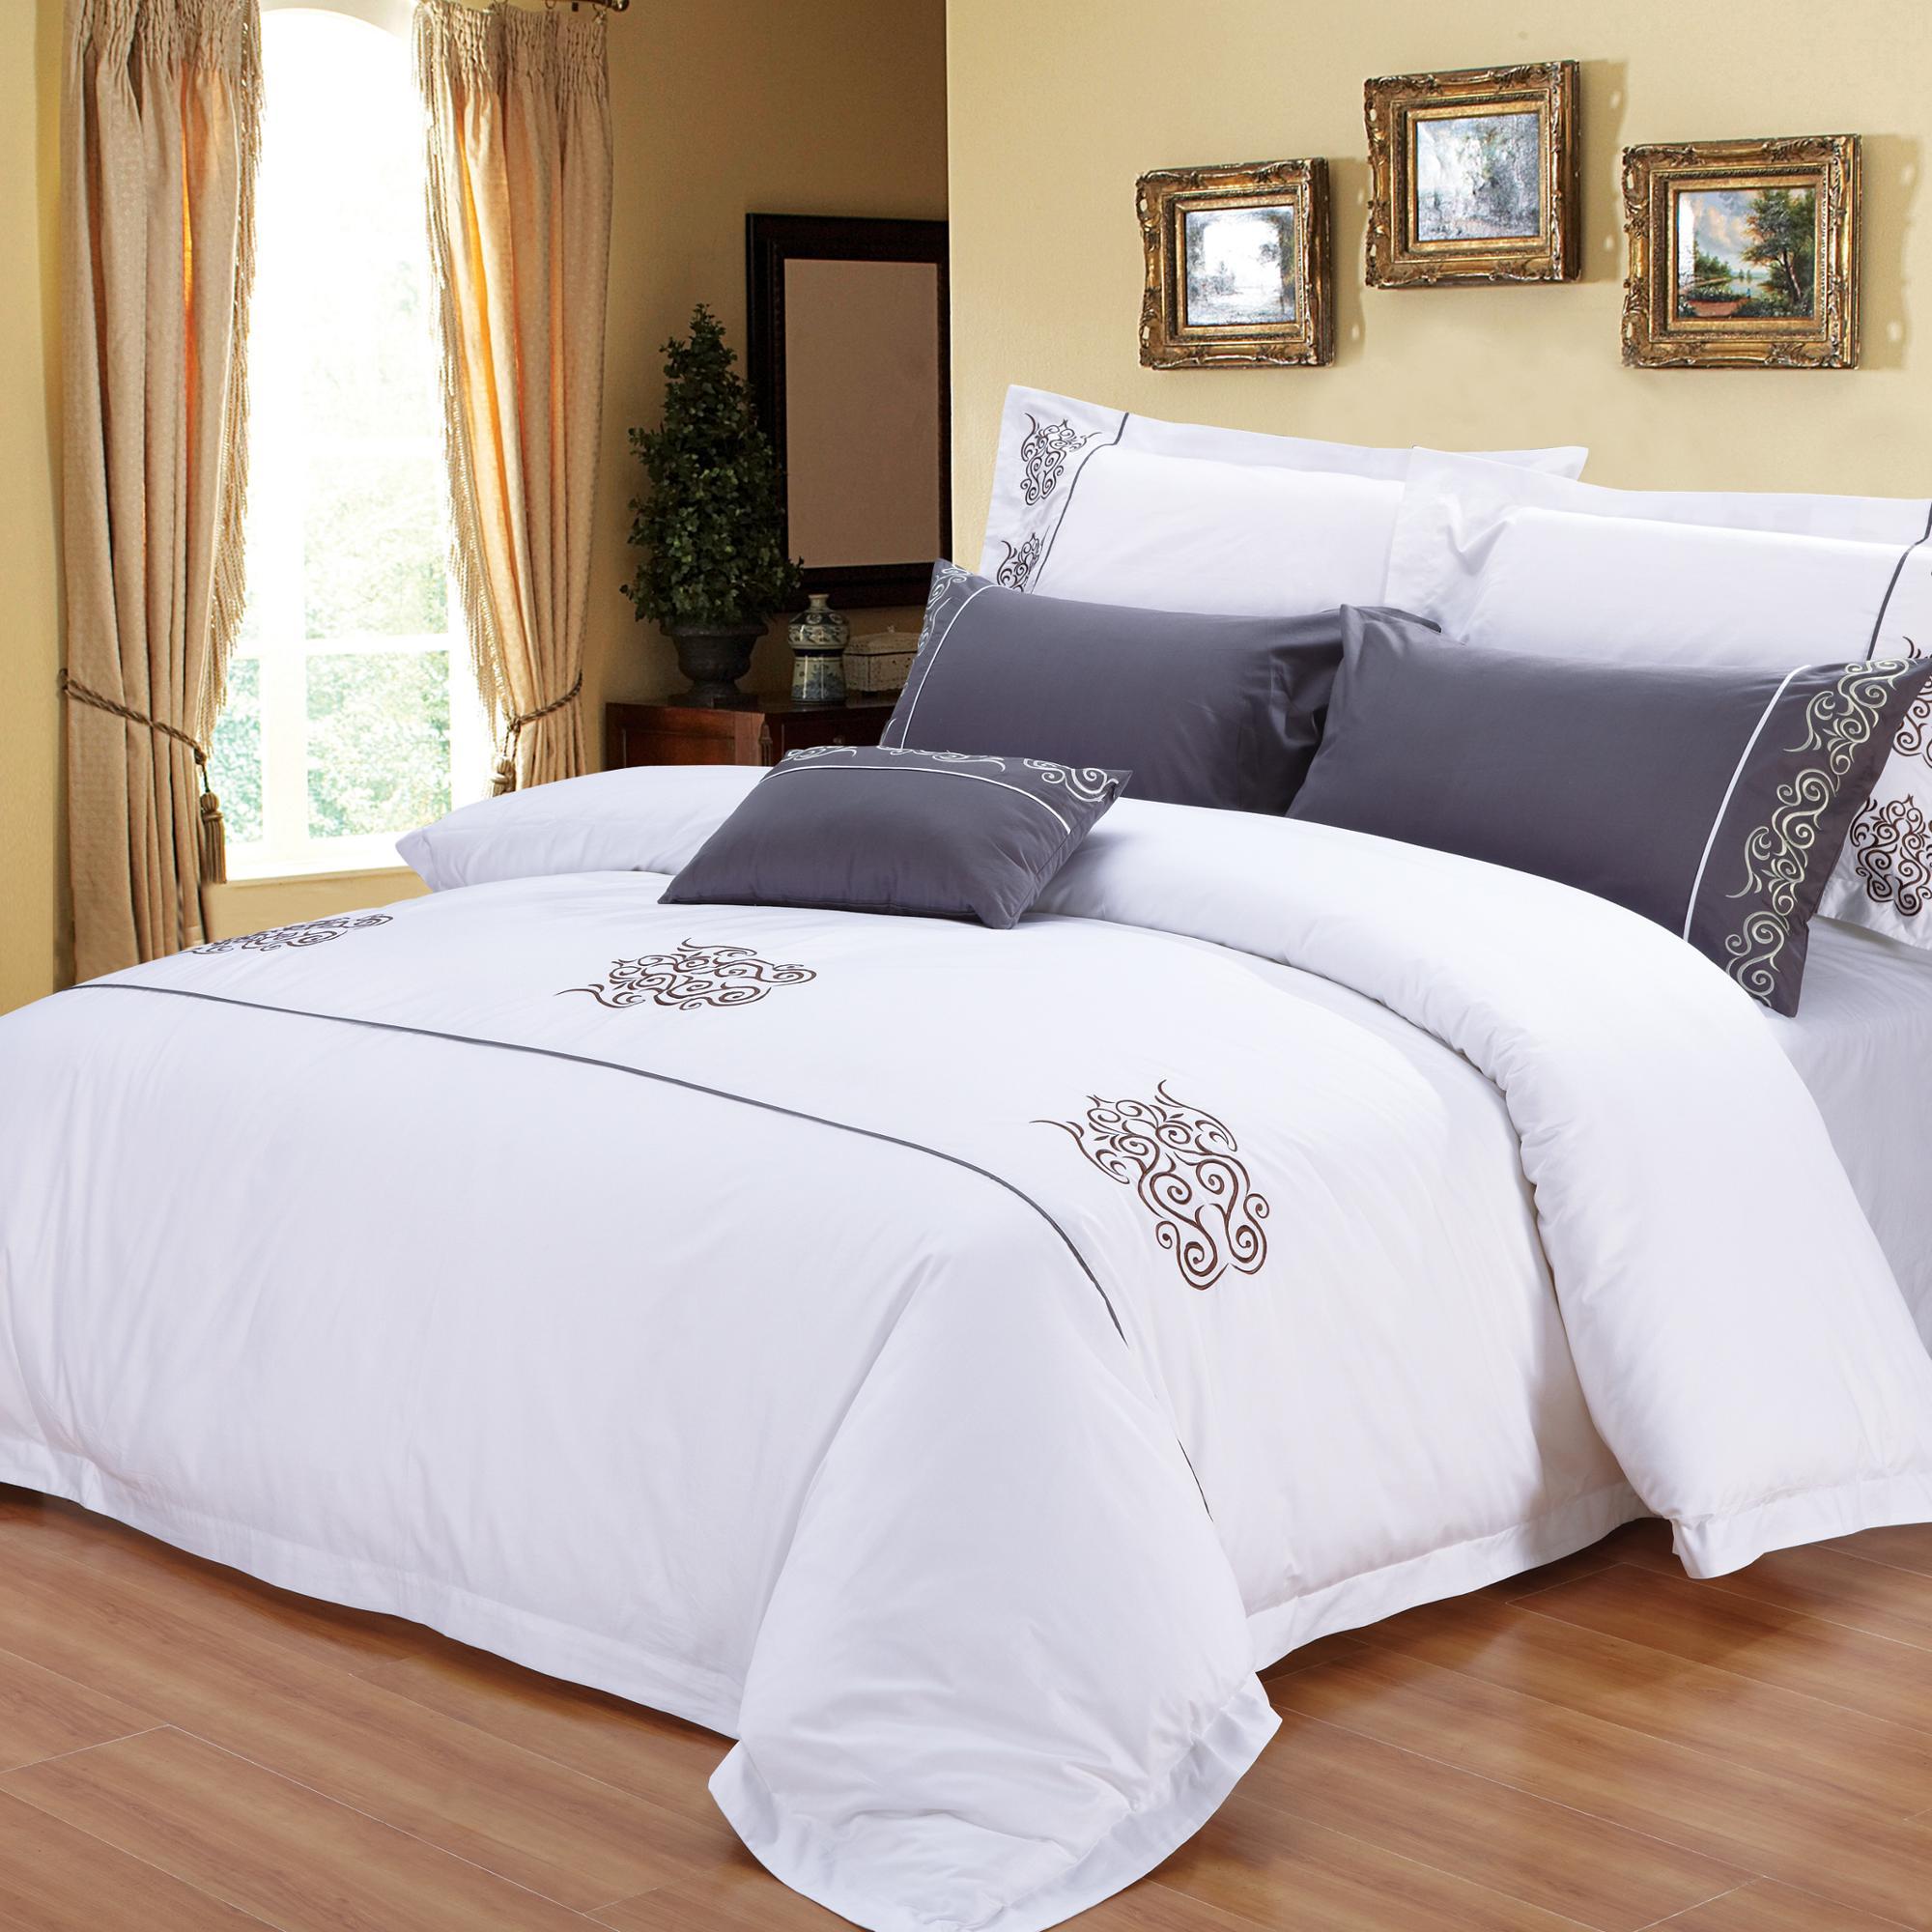 Whole 100 Cotton Good Quality Bedding Set